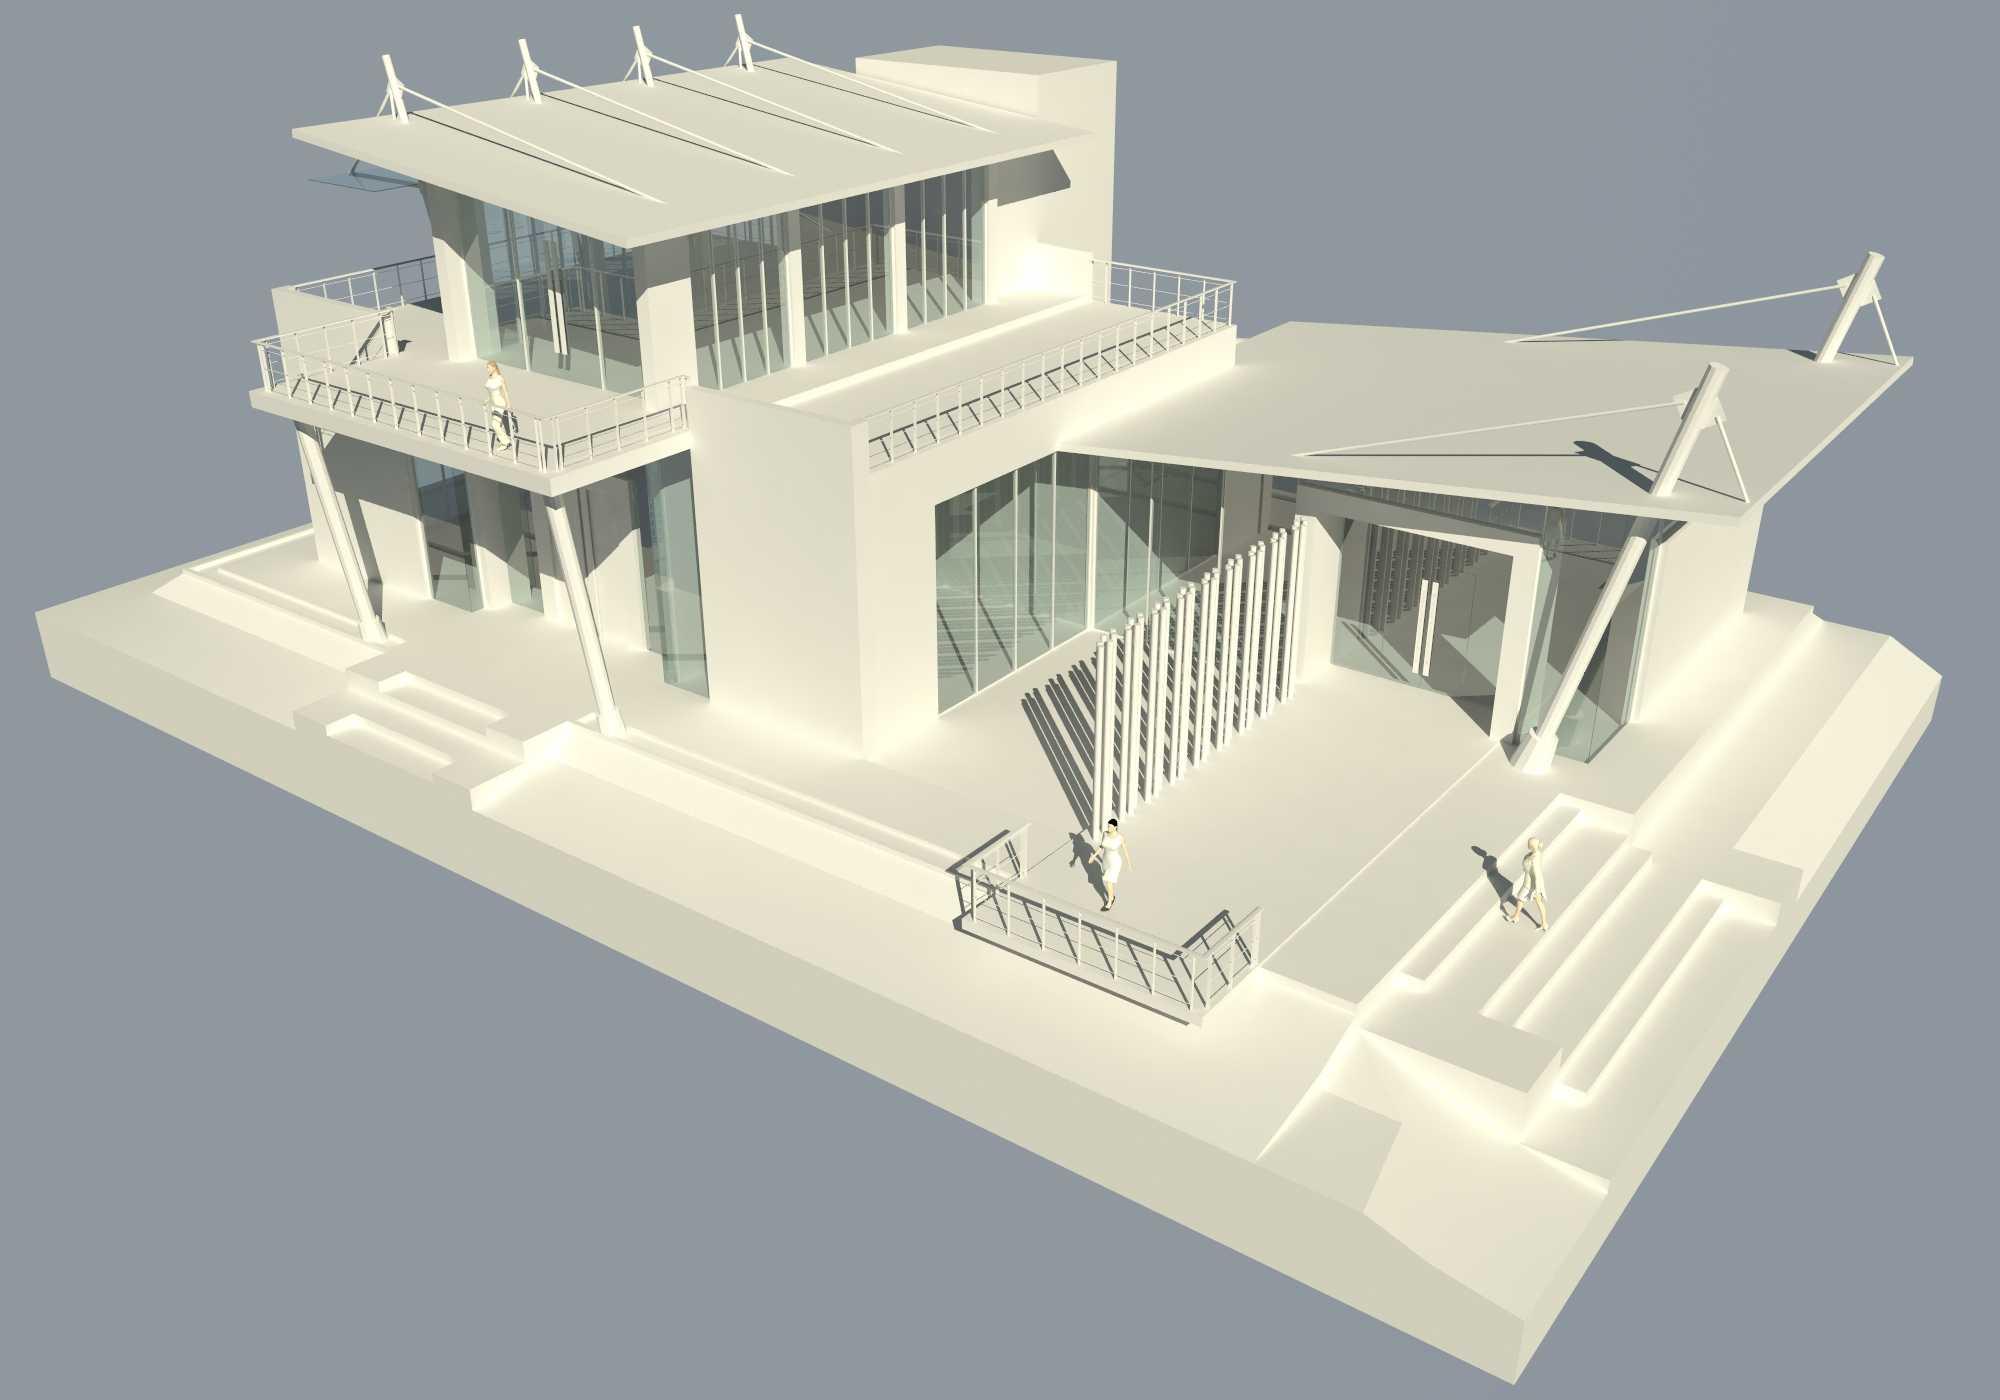 Budi Dharma Office Villa At Sukabumi Jawa Barat Jawa Barat Perspektive-06   24477